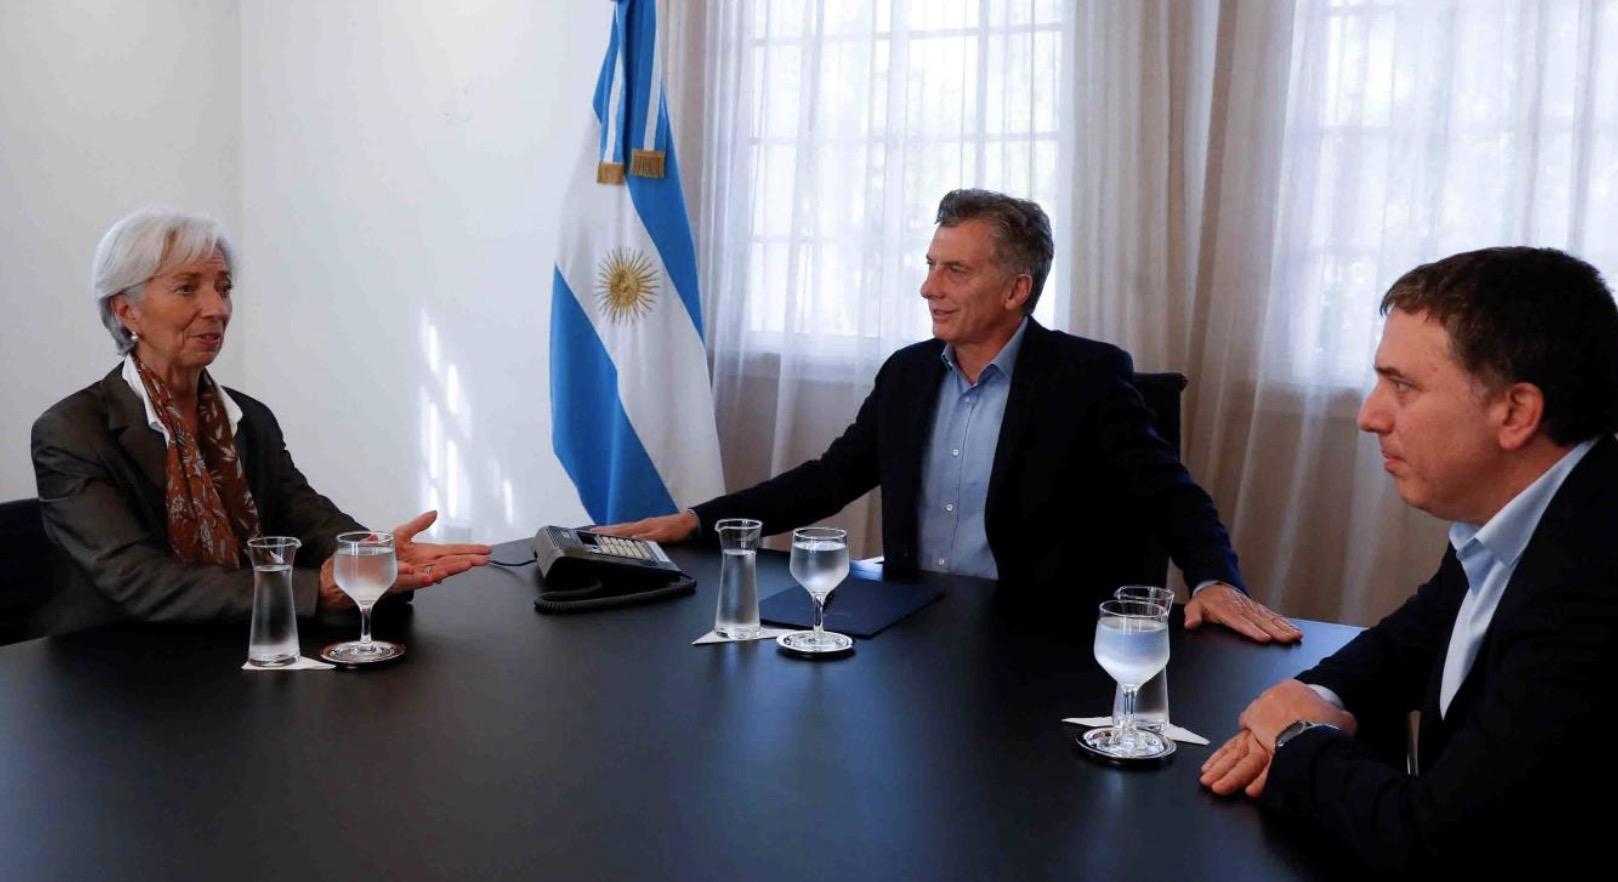 Nicolás Dujovne, Lagarde, Macri